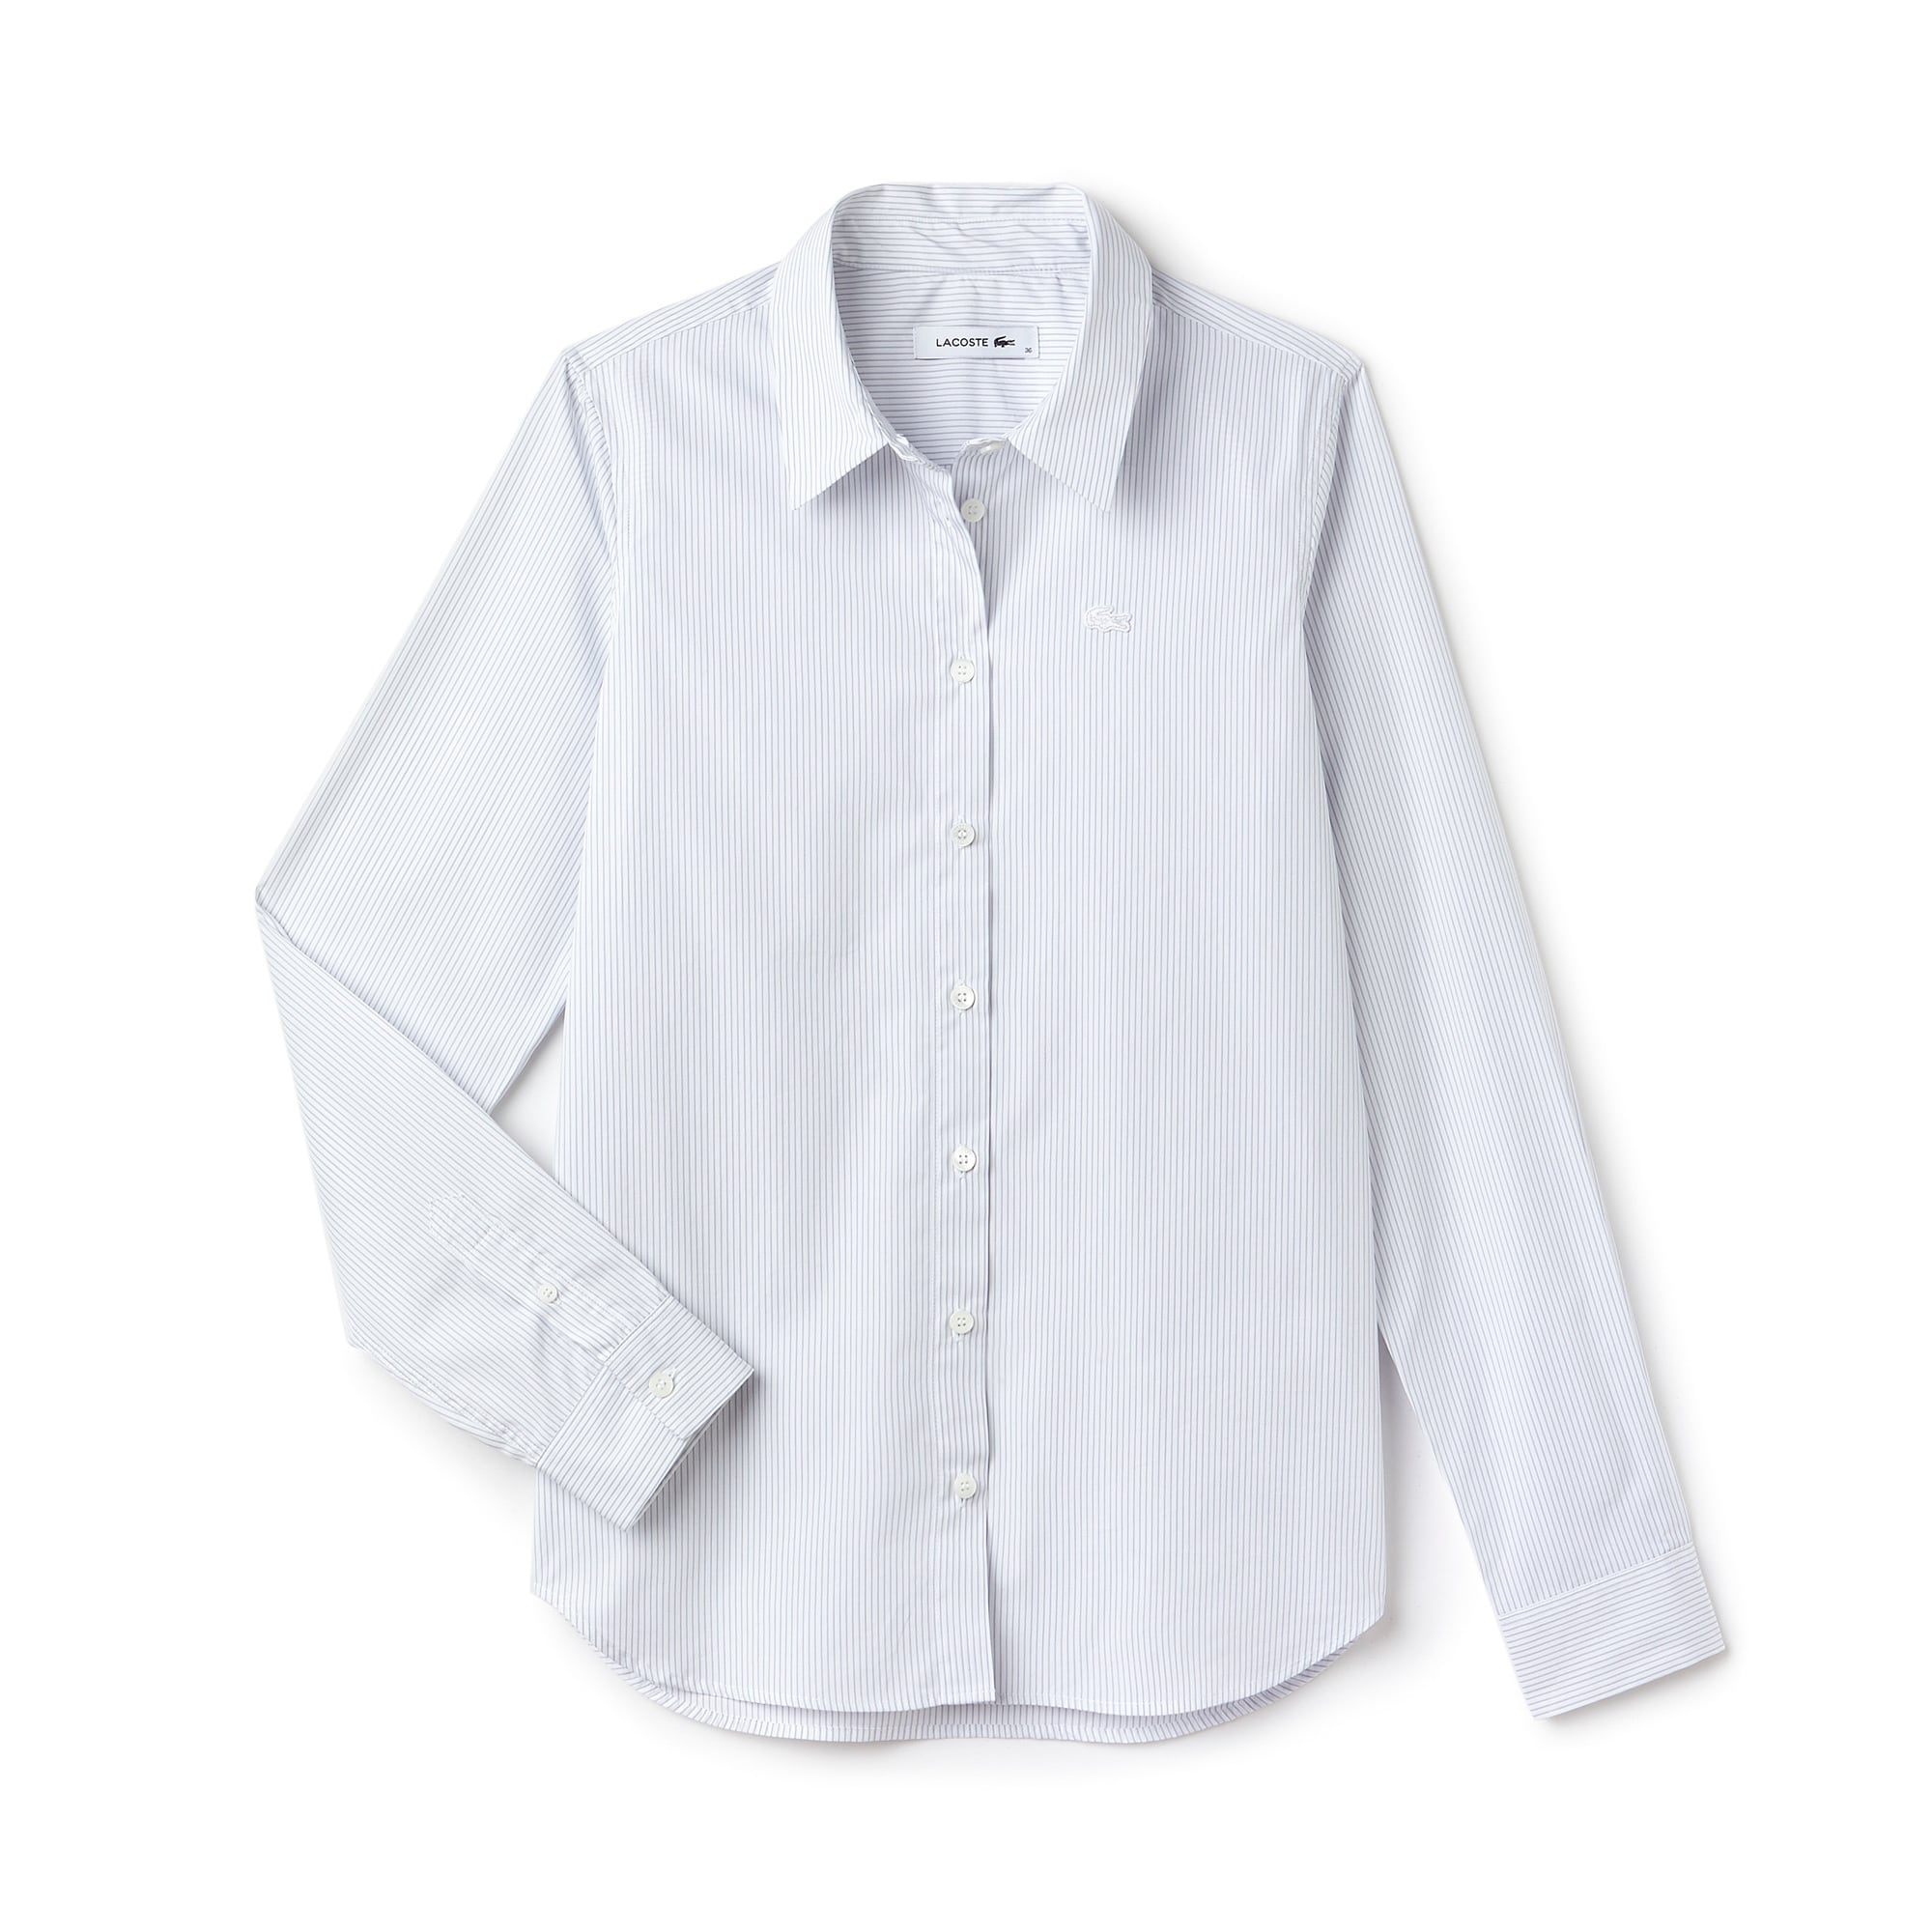 Women's Regular Fit Striped Poplin Shirt